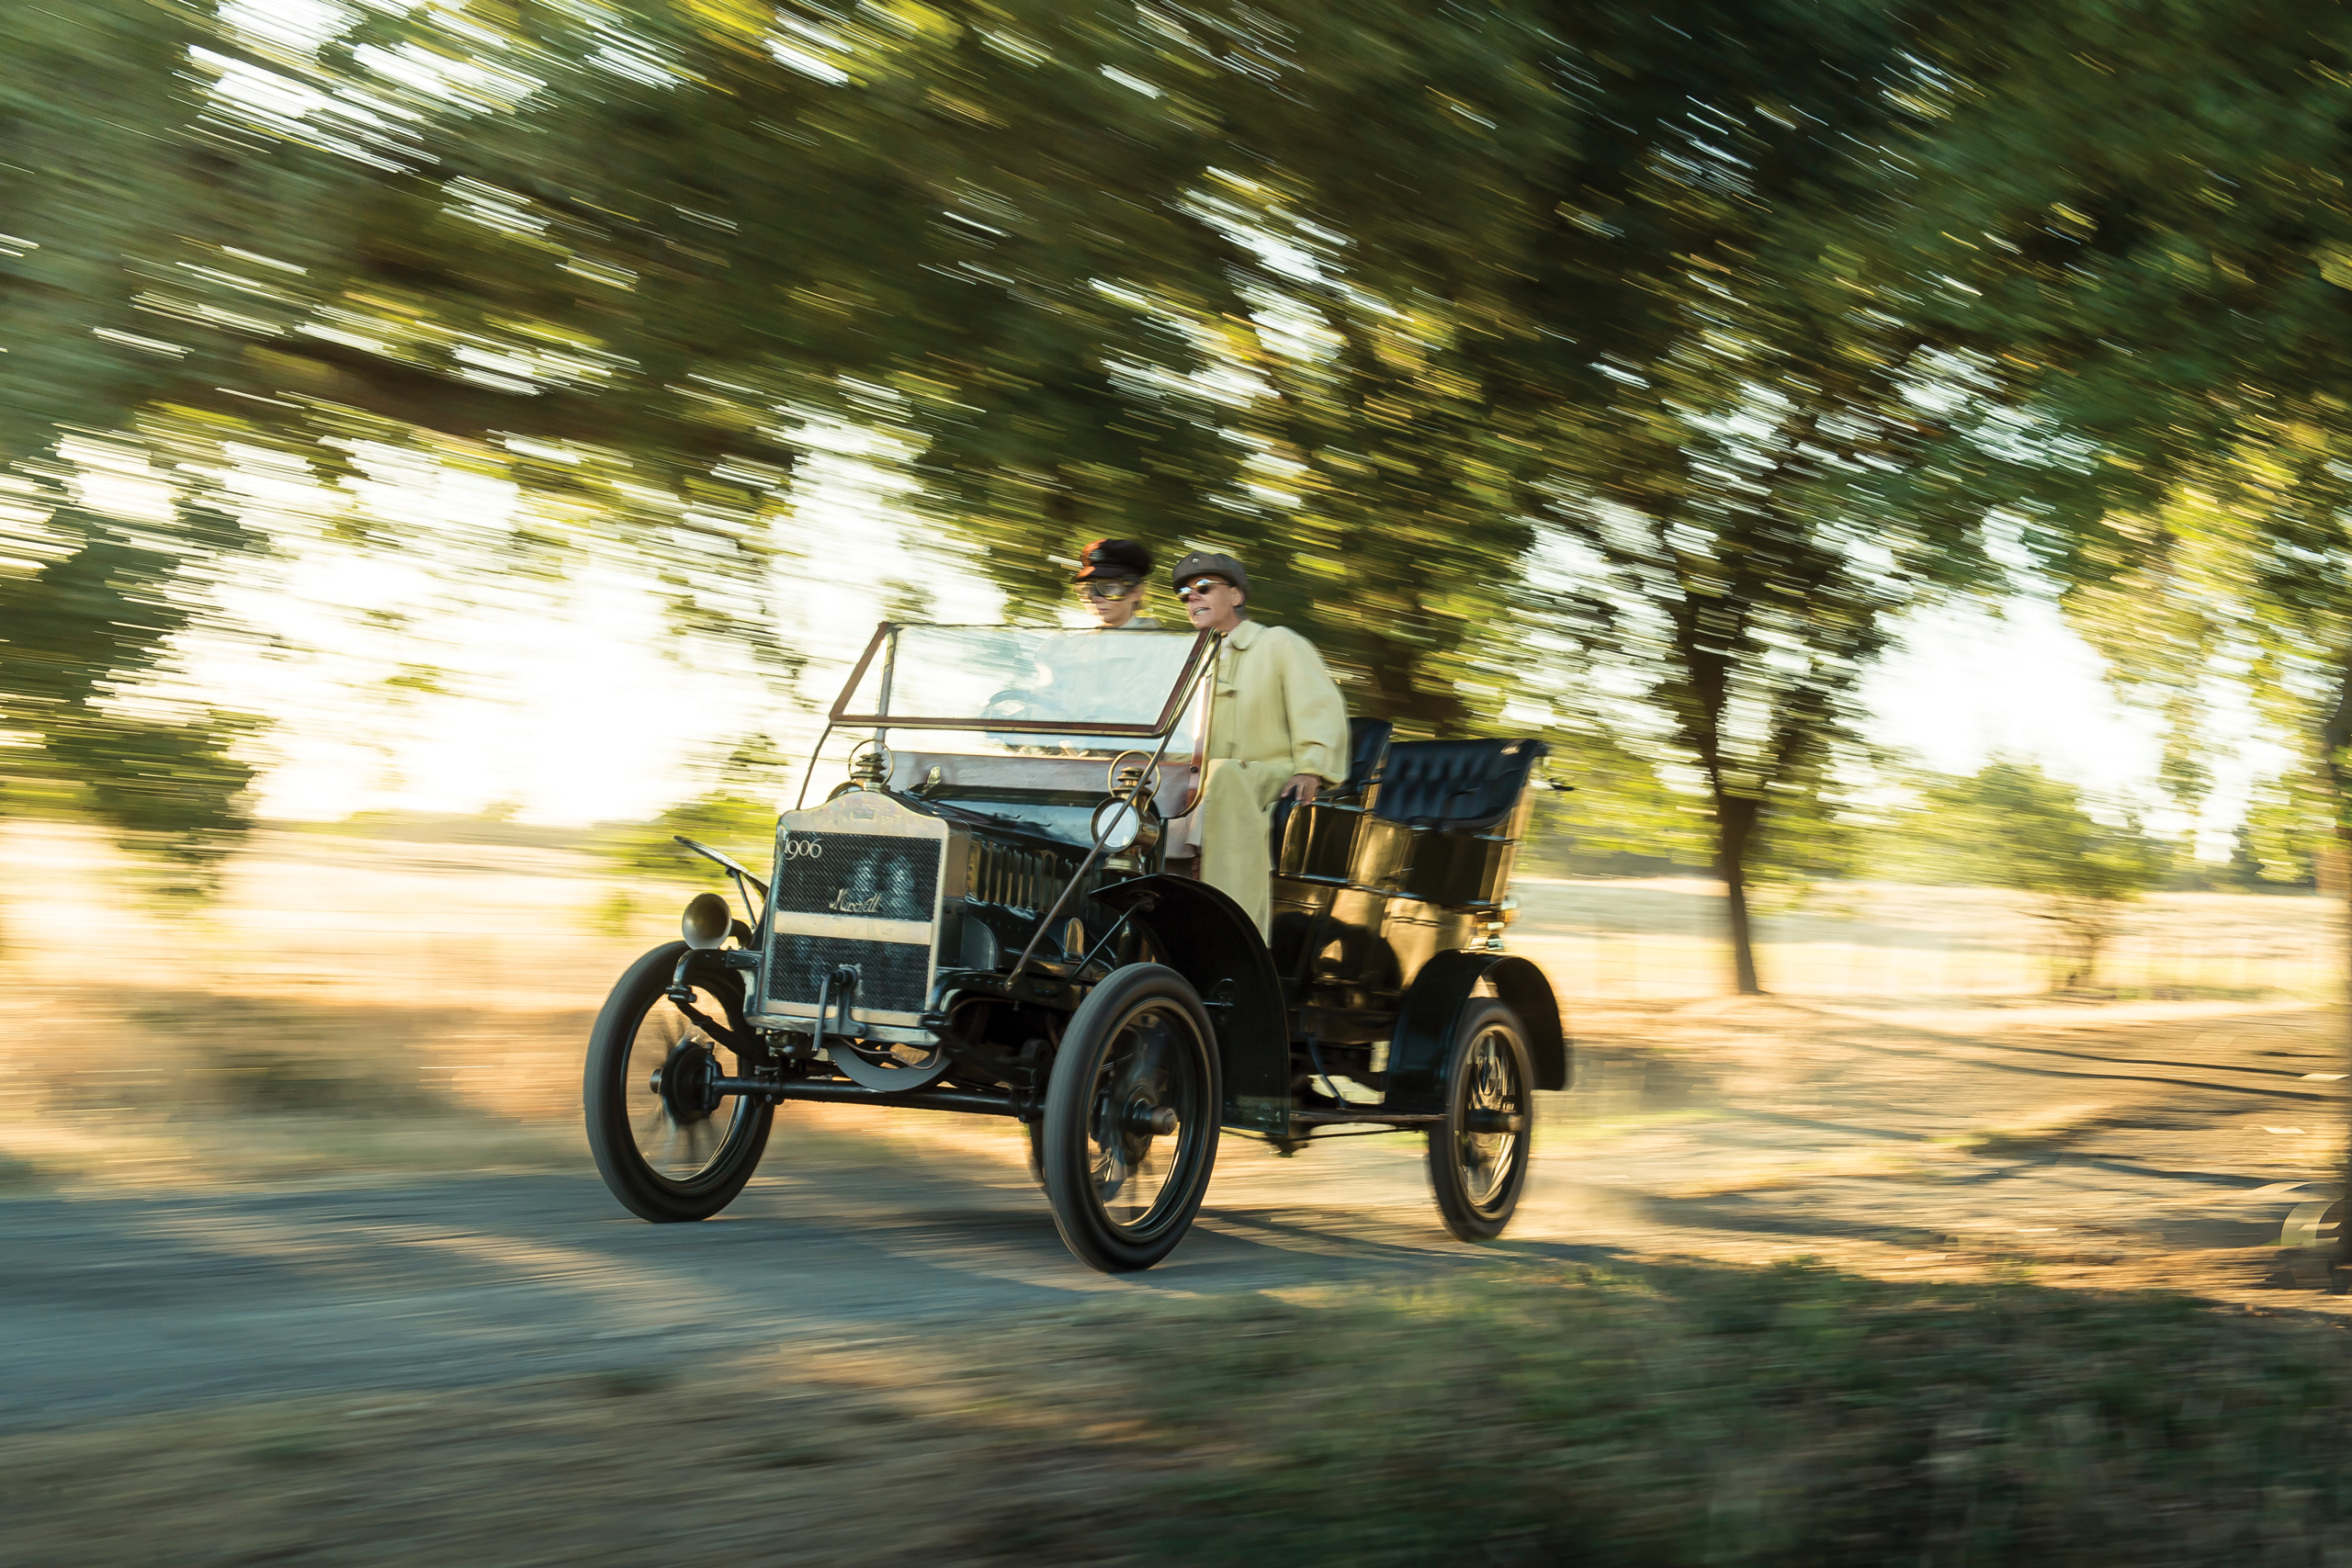 Alice in Yonder Land: Recreating Alice Ramsey's epic drive across America in 1909